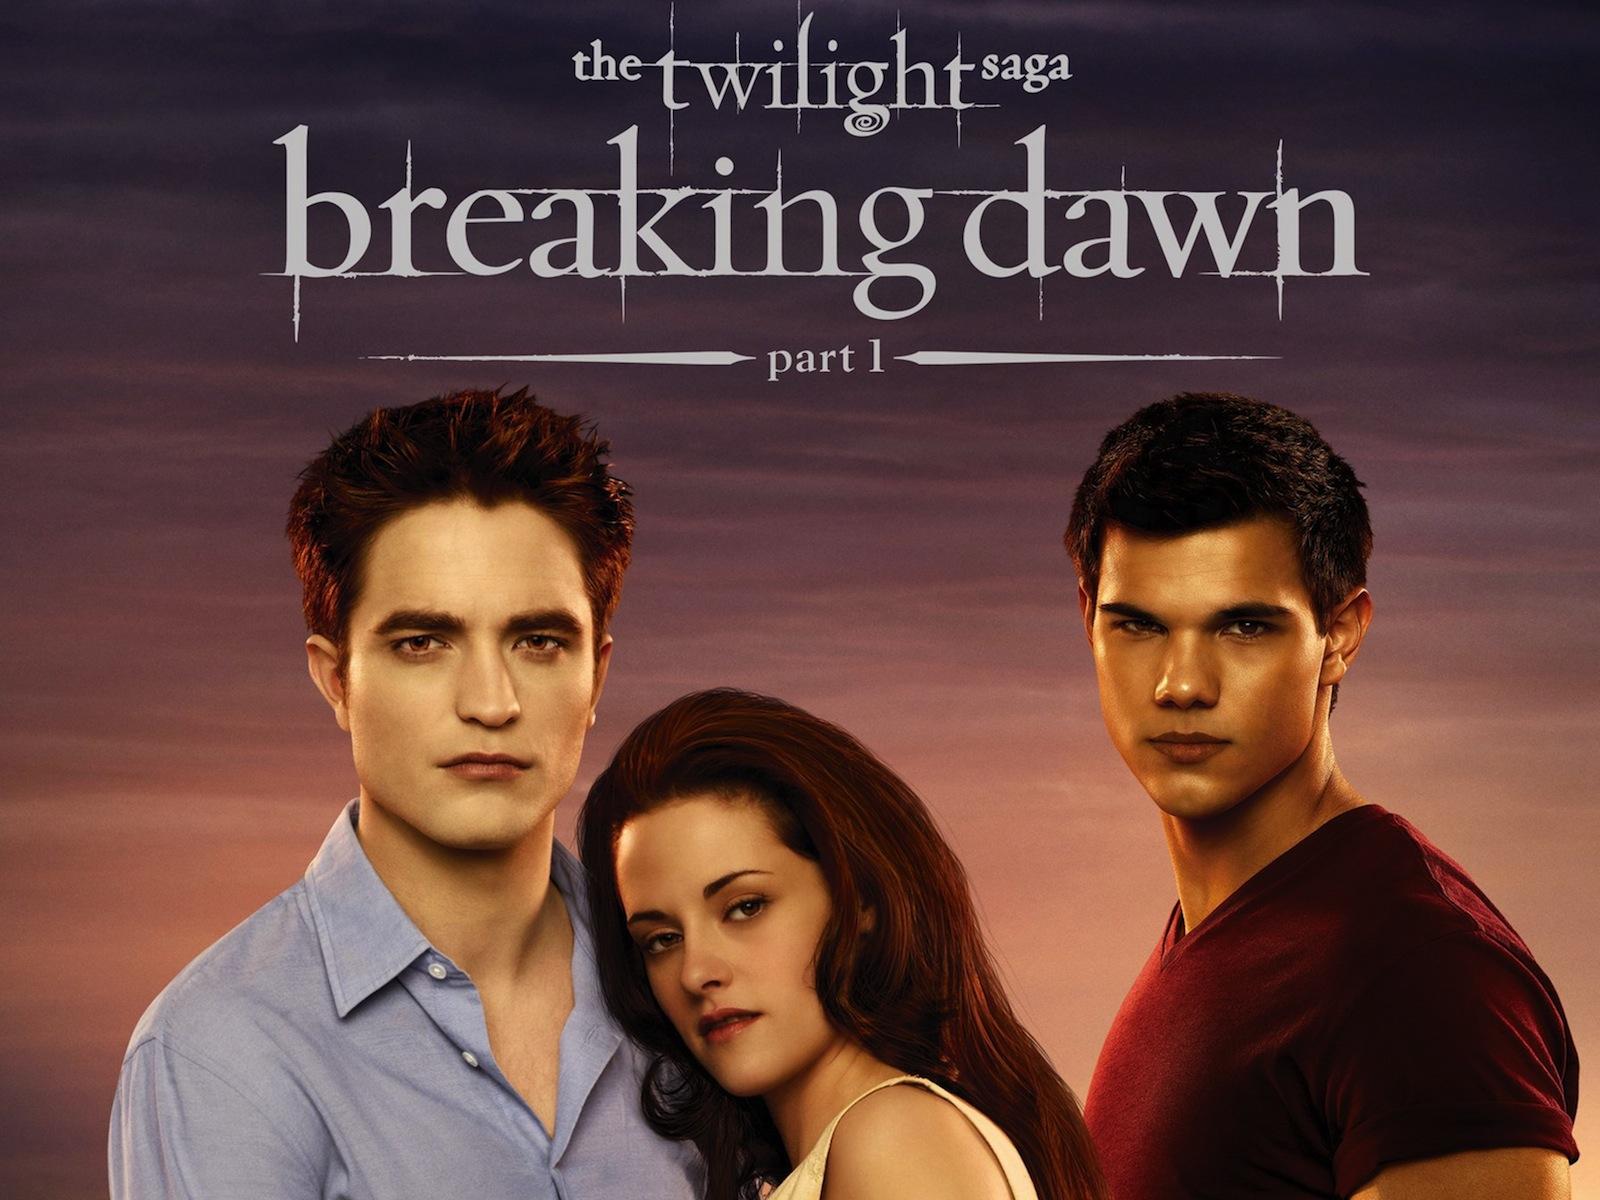 Desktop Wallpapers The Twilight Saga Breaking Dawn The Twilight Saga Taylor Lautner Kristen Stewart Robert Pattinson Movies film